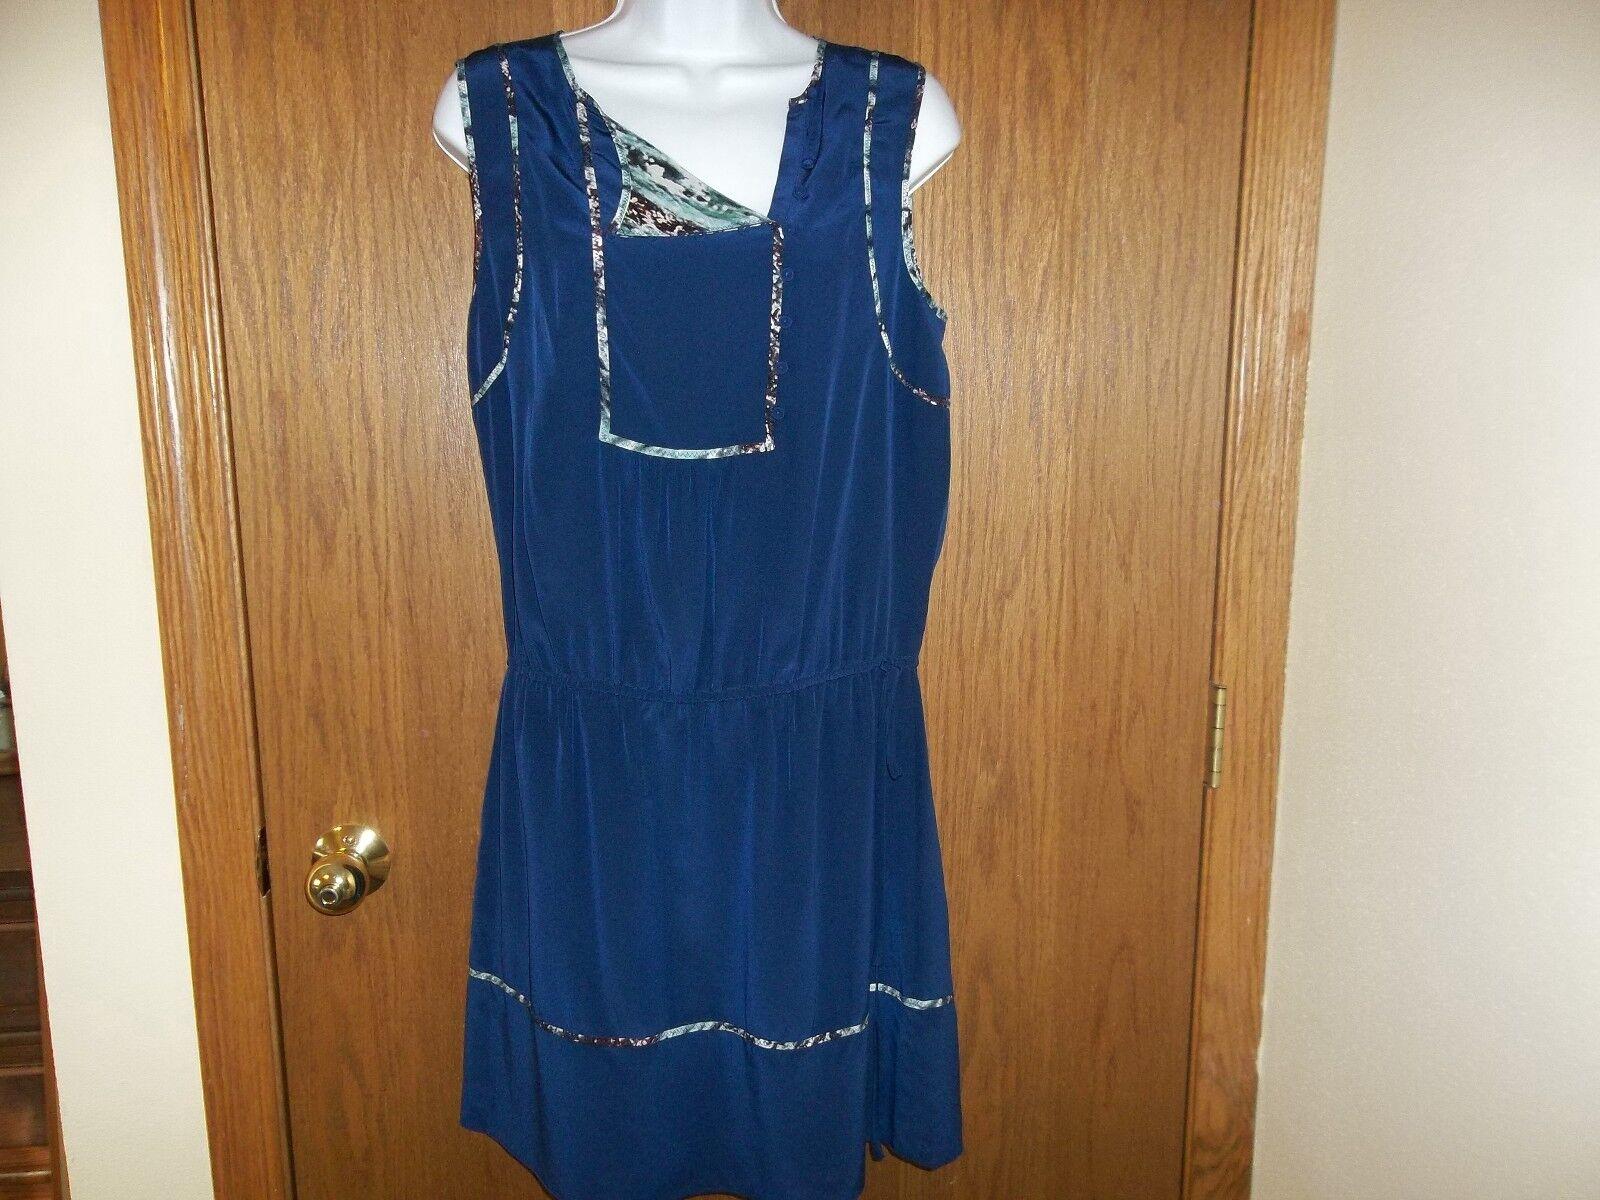 NEW WOMEN'S WOMEN'S WOMEN'S BCBG MAXAZRIA MAX AZRIA blueE SILK DRESS SIZE SMALL MSP  248.00 2be19b